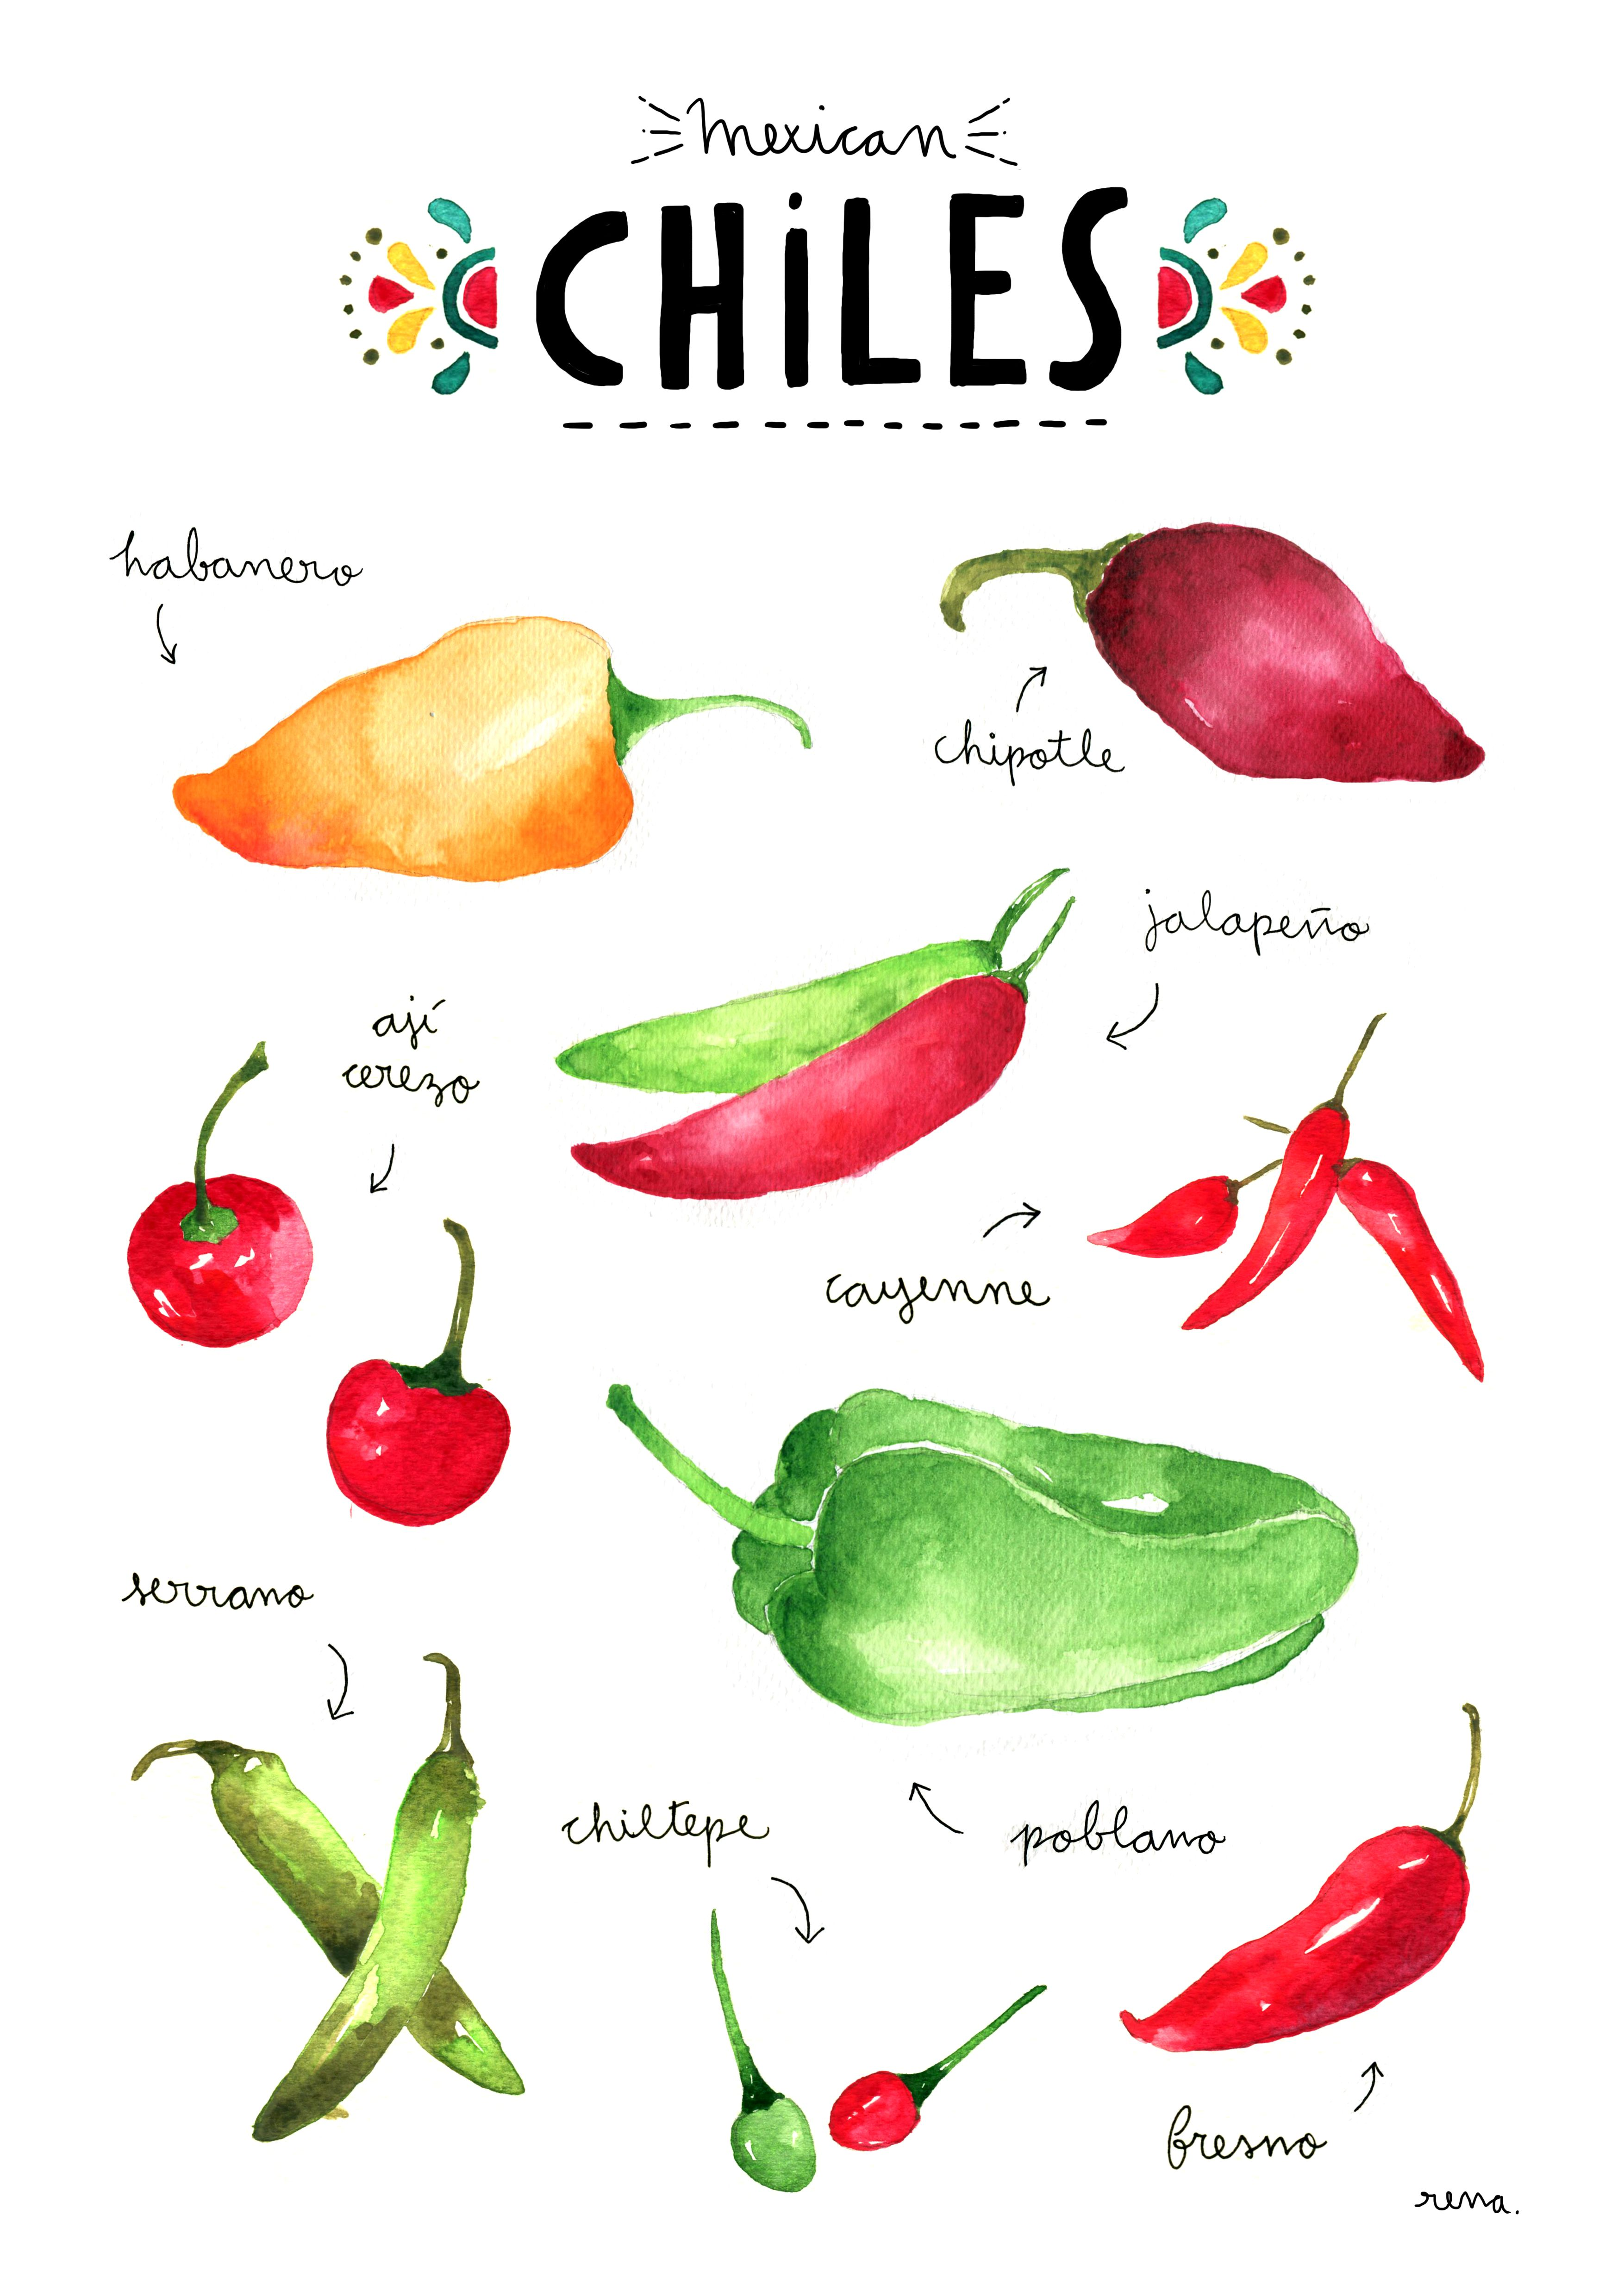 My Favourite Mexican Chillies Illustration By Rena Ortega Chile Mexicano Comida Mexicana Tradicional Tipos De Chiles